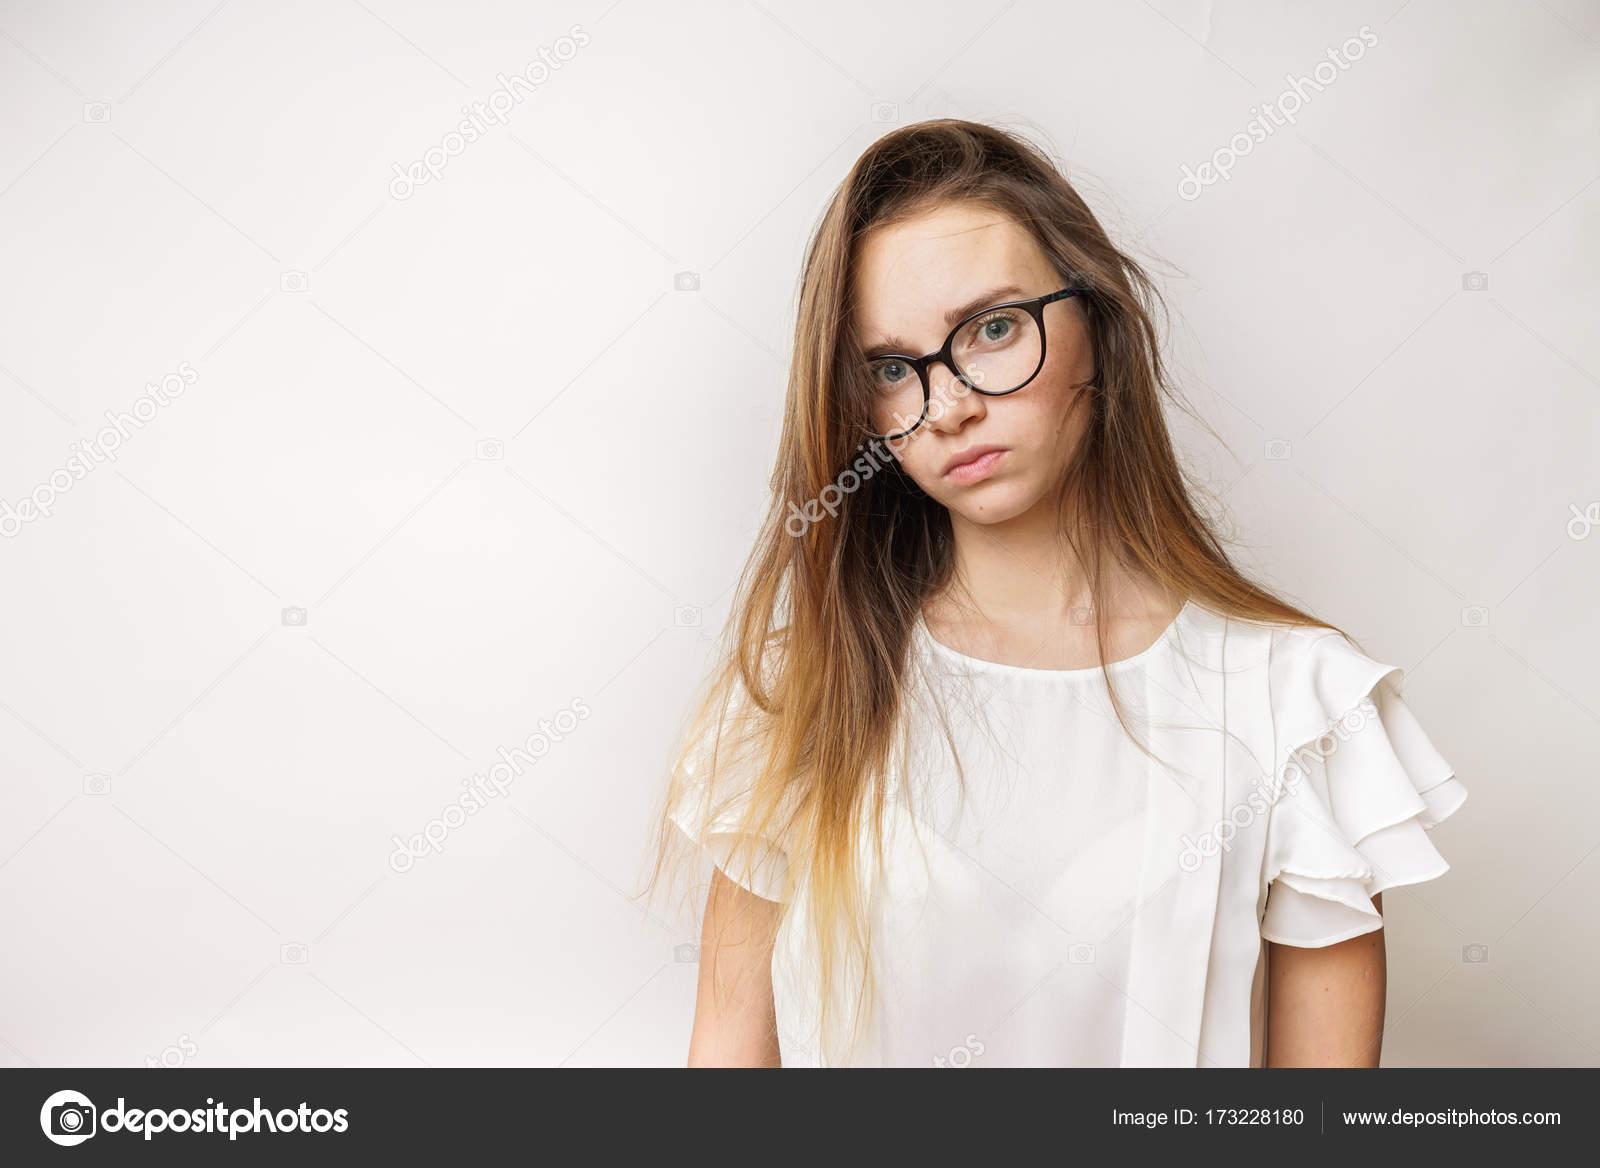 26dc0c066d θλιβερή νεαρή κοπέλα με μακριά ξανθά μαλλιά